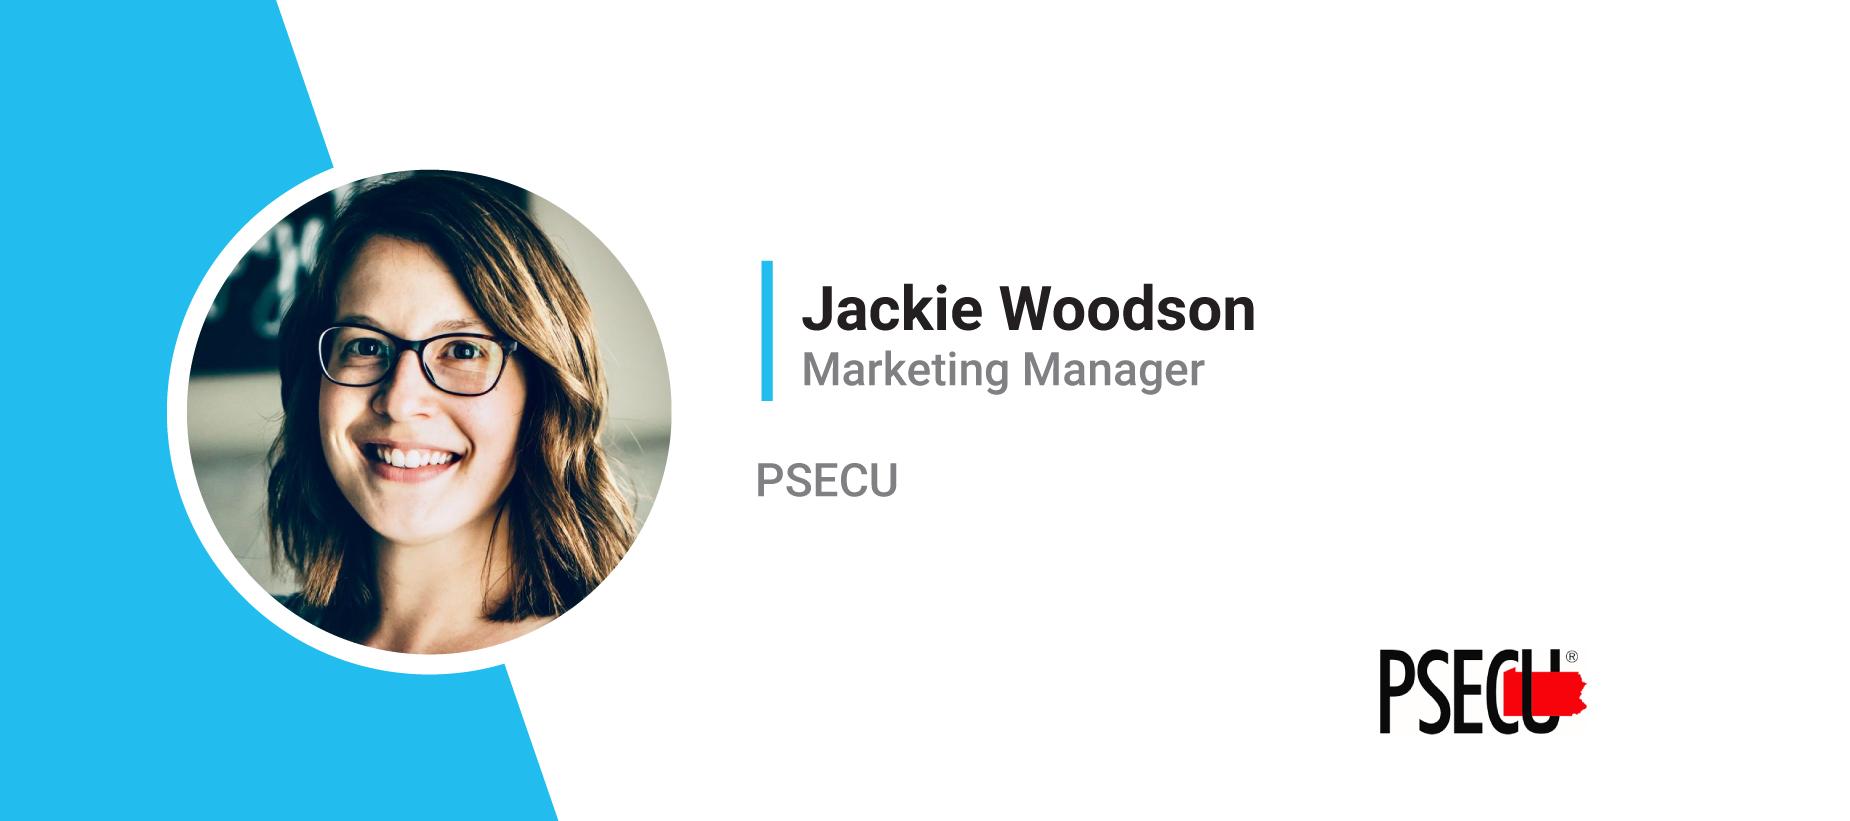 Jackie Woodson, PSECU